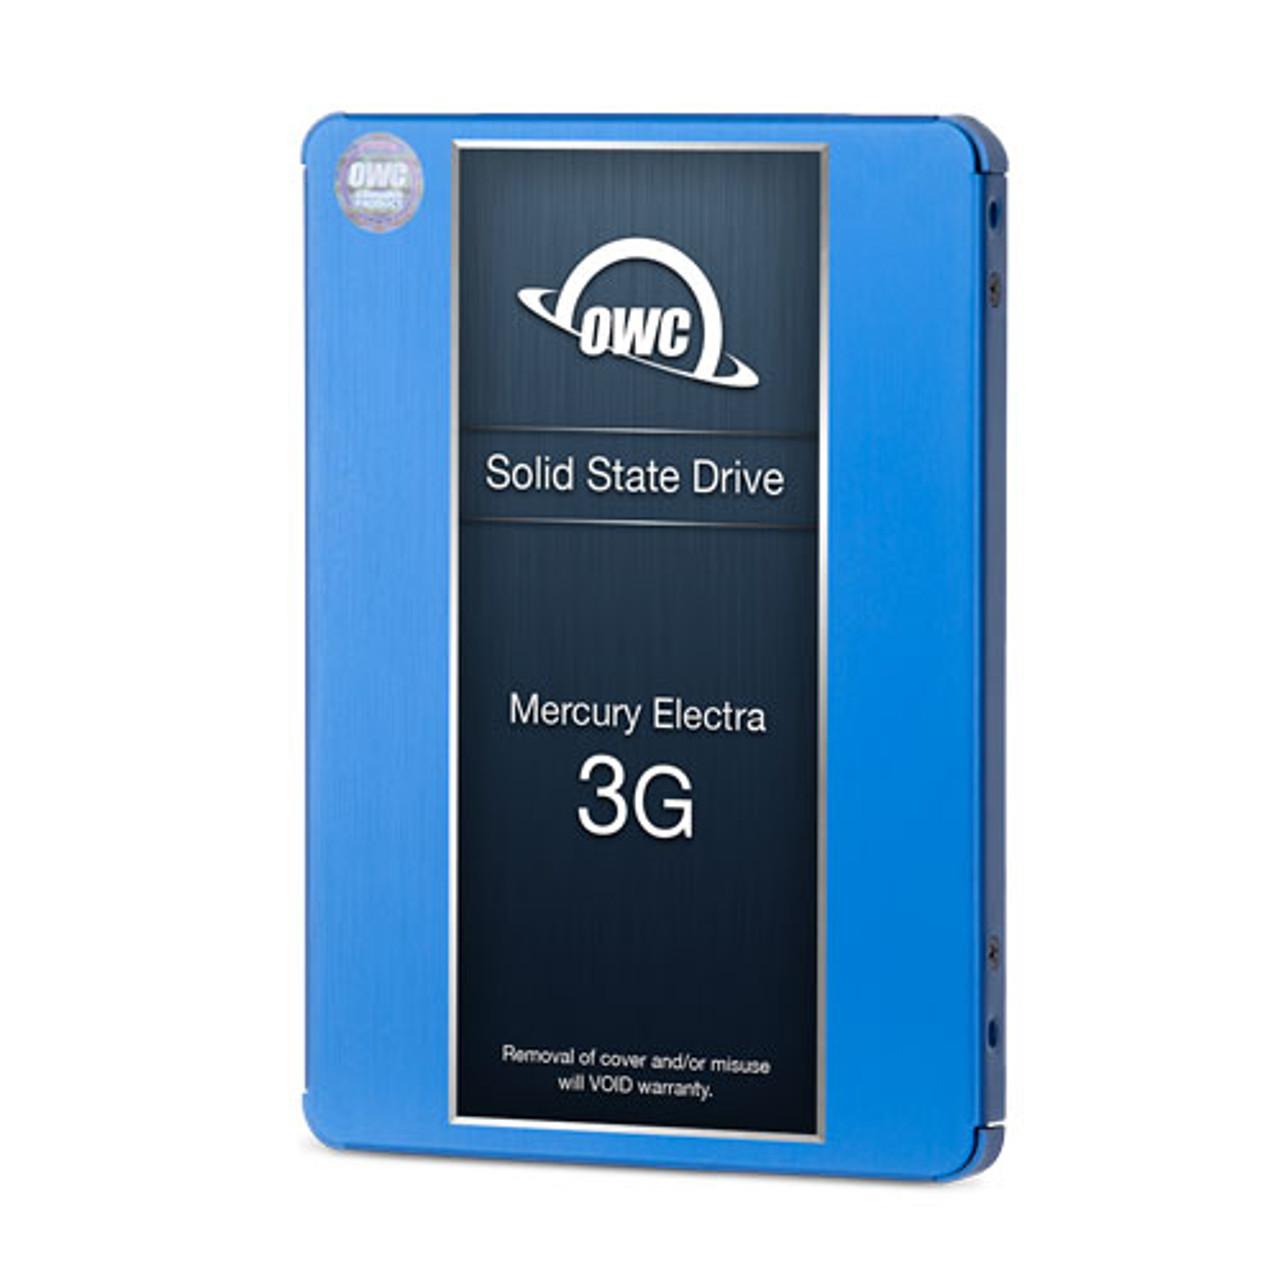 1TB Mercury Electra 3G SSD and Adapta-Drive 2.5-inch to 3.5-inch DIY bundle kit